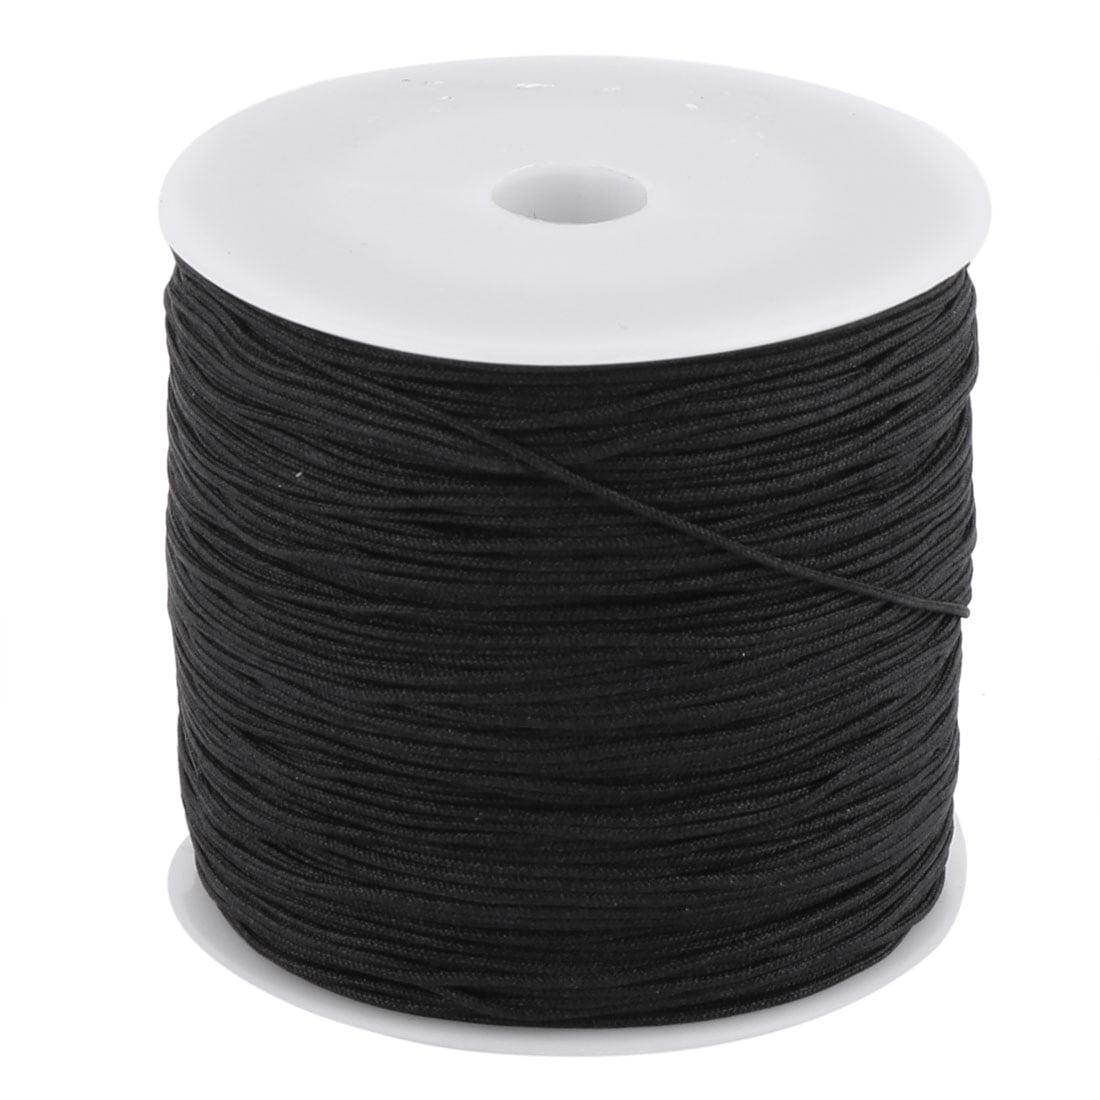 Nylon Chinese Knot DIY Handcraft Braided Cord String Black 0.8mm Dia 110 Yards